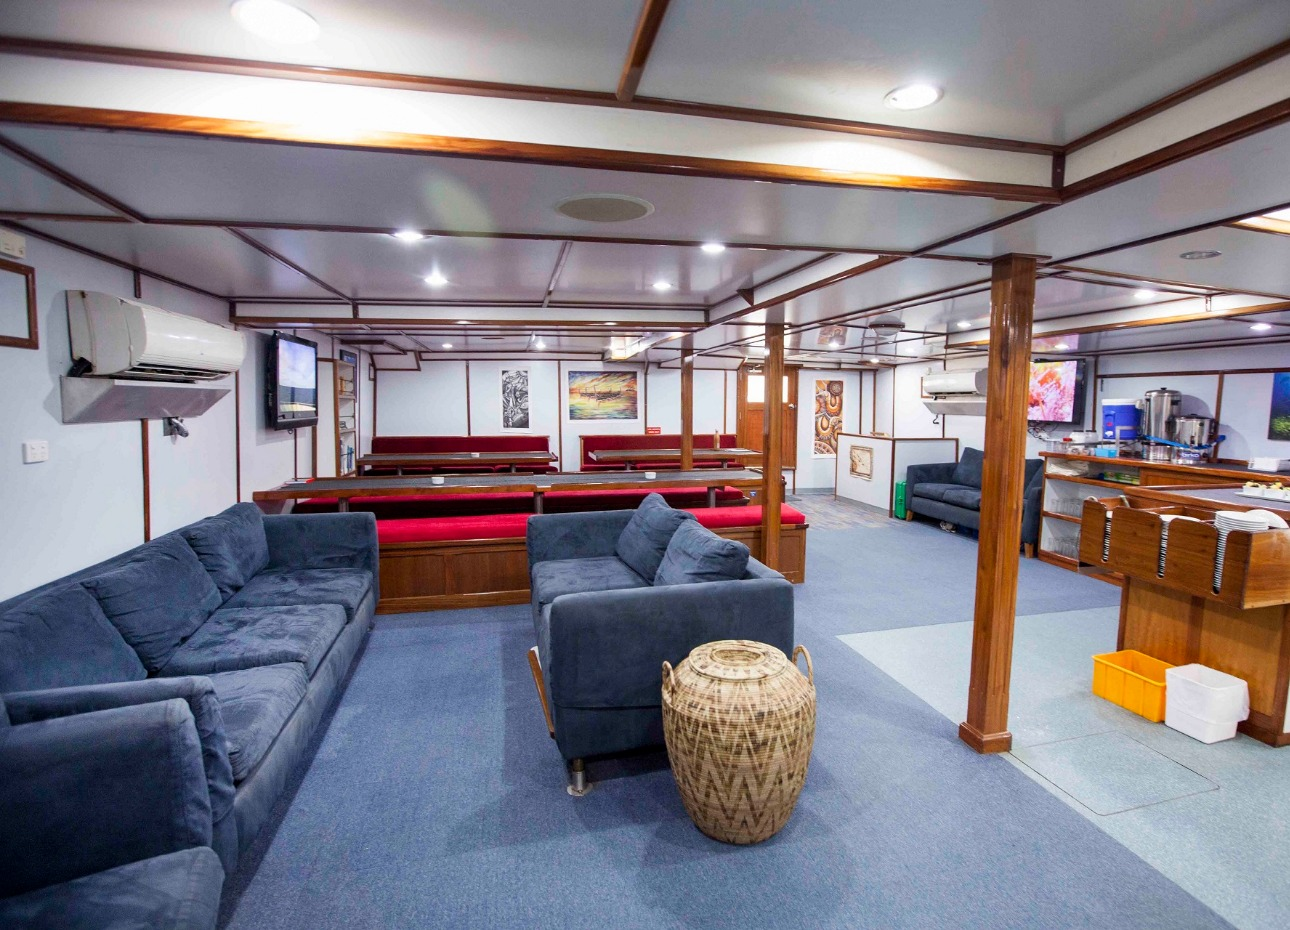 M/V Papa New Guinea, Solomons Master, Lounge Area, image